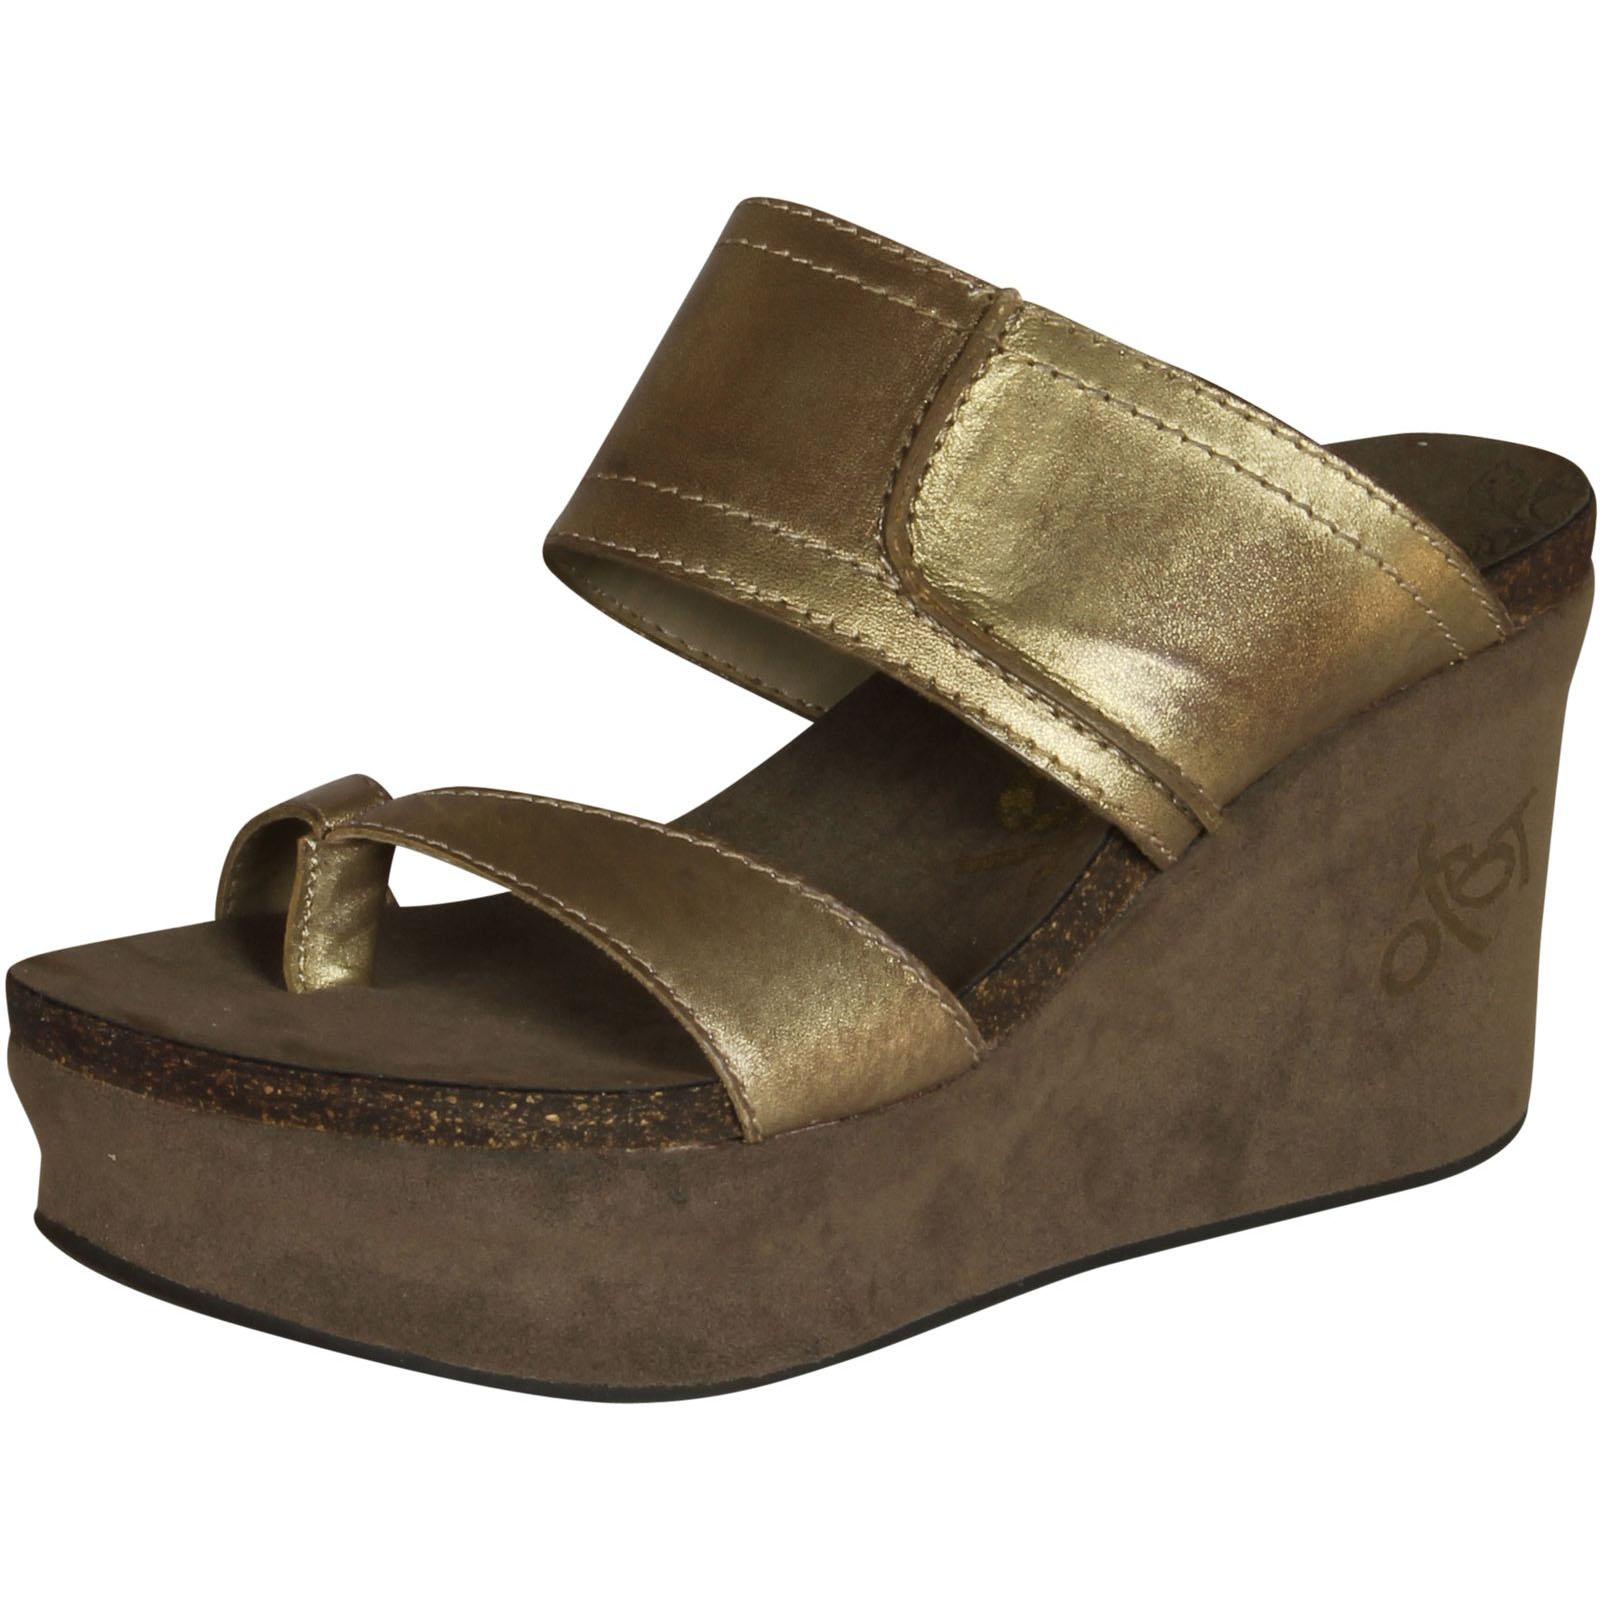 9ffa5be58fa0 OTBT Womens Brookfield Fashion Wedge Sandals